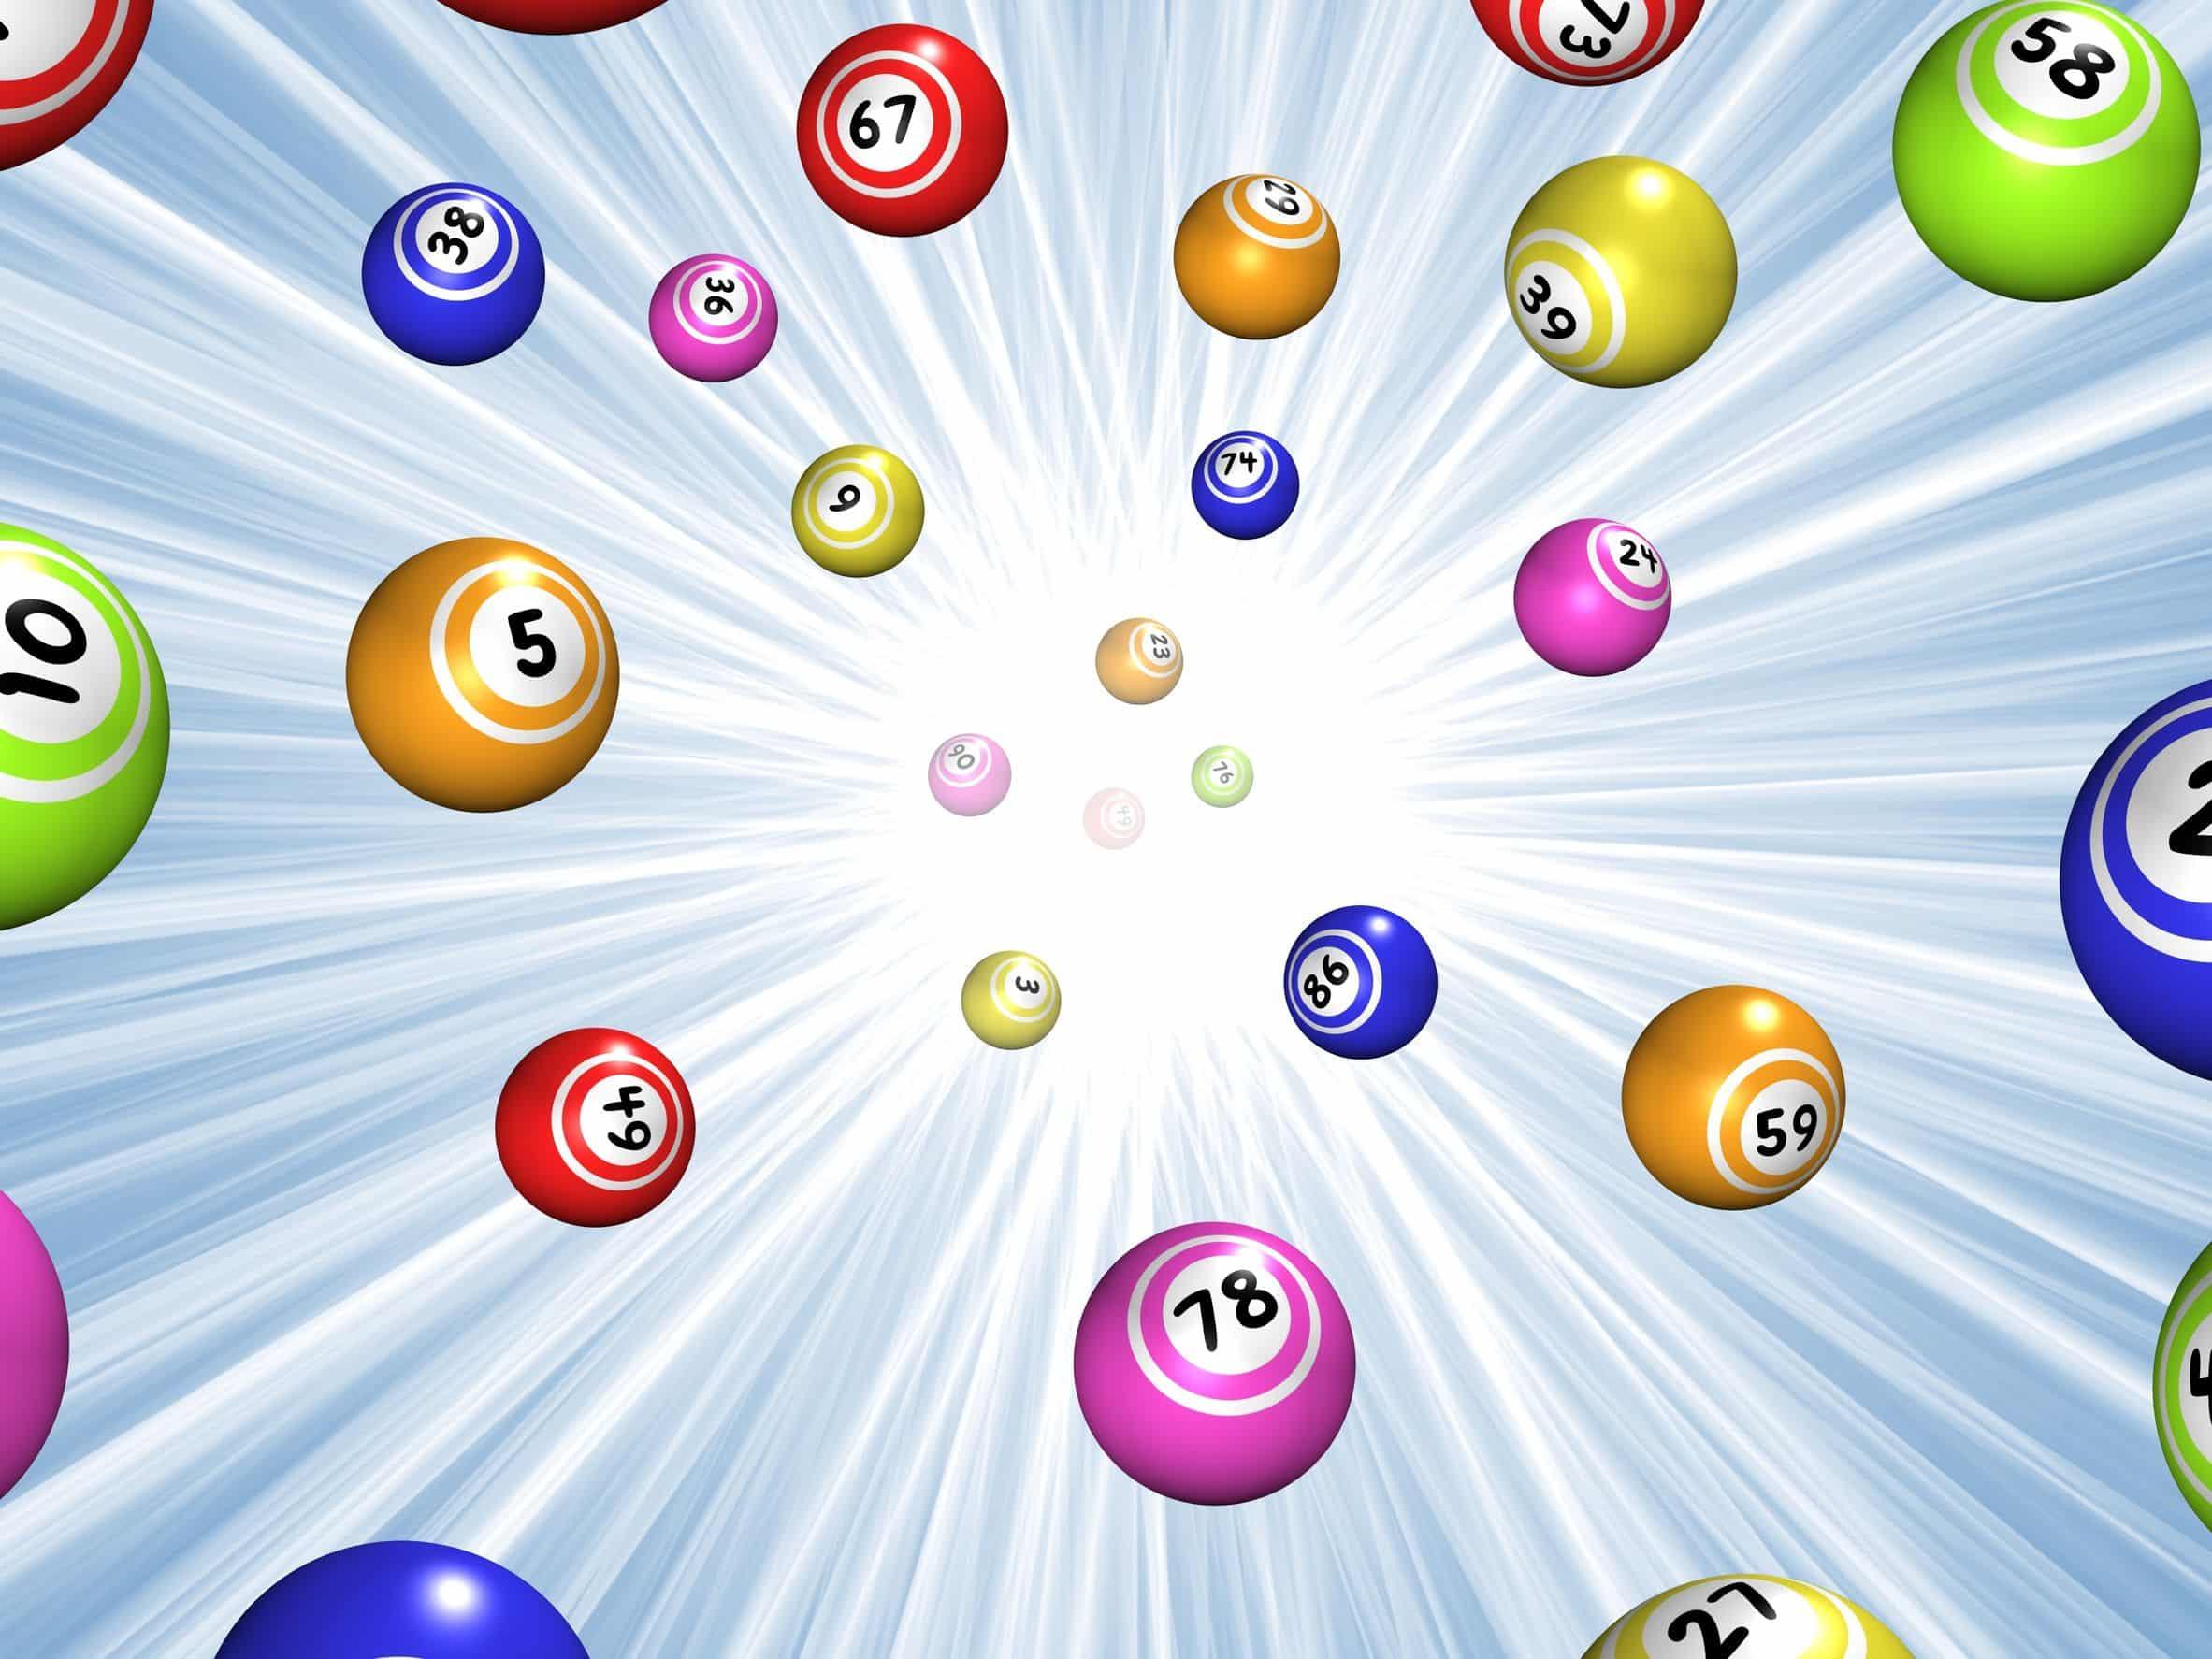 illustration of bingo balls over a blue starburst background